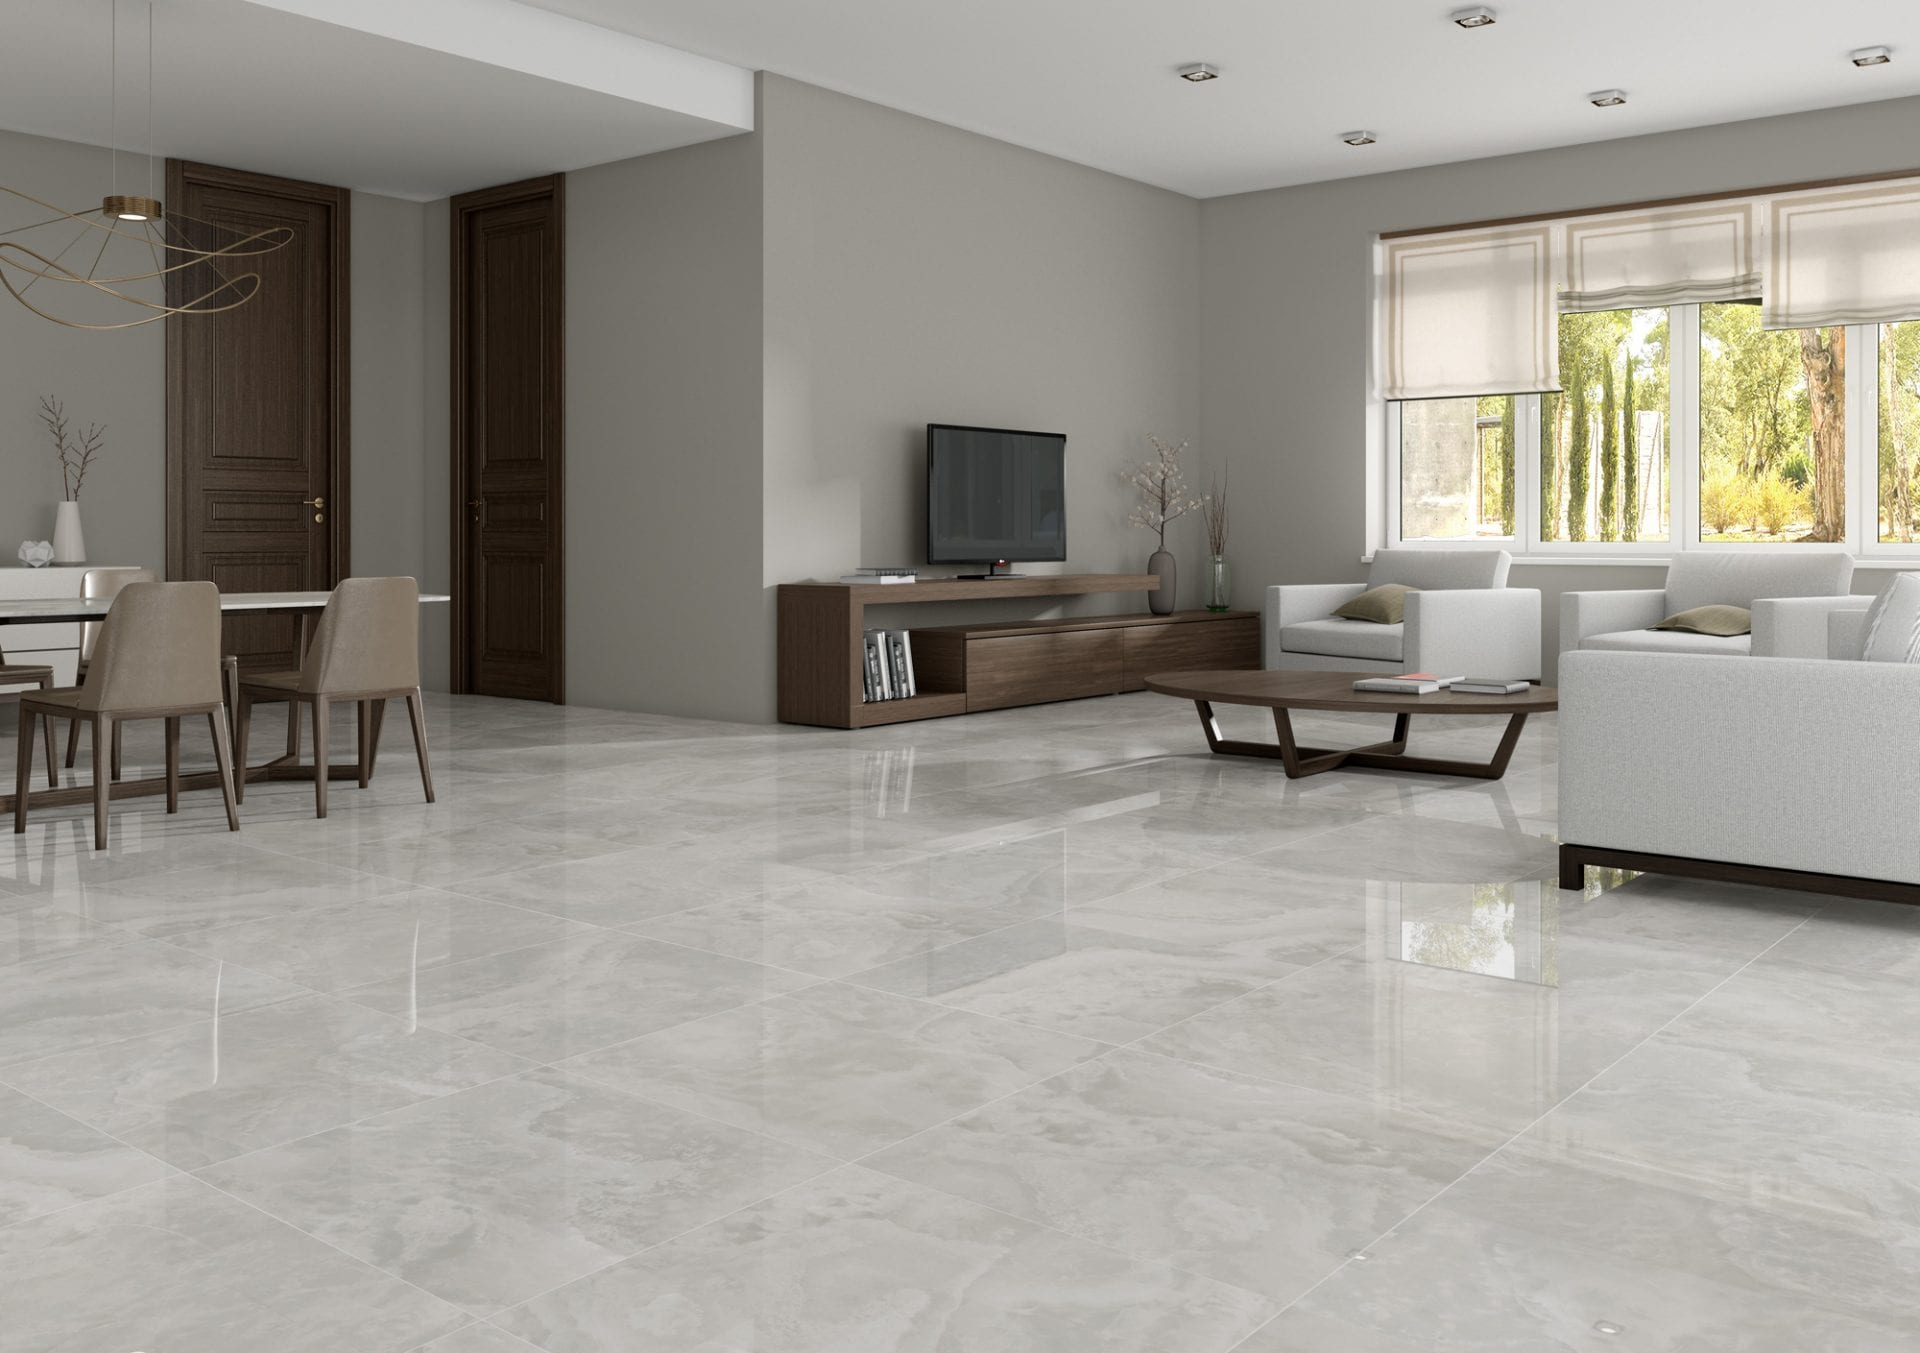 Serie lari porcelanico tipo m rmol brillo disponible - Pavimentos de marmol ...